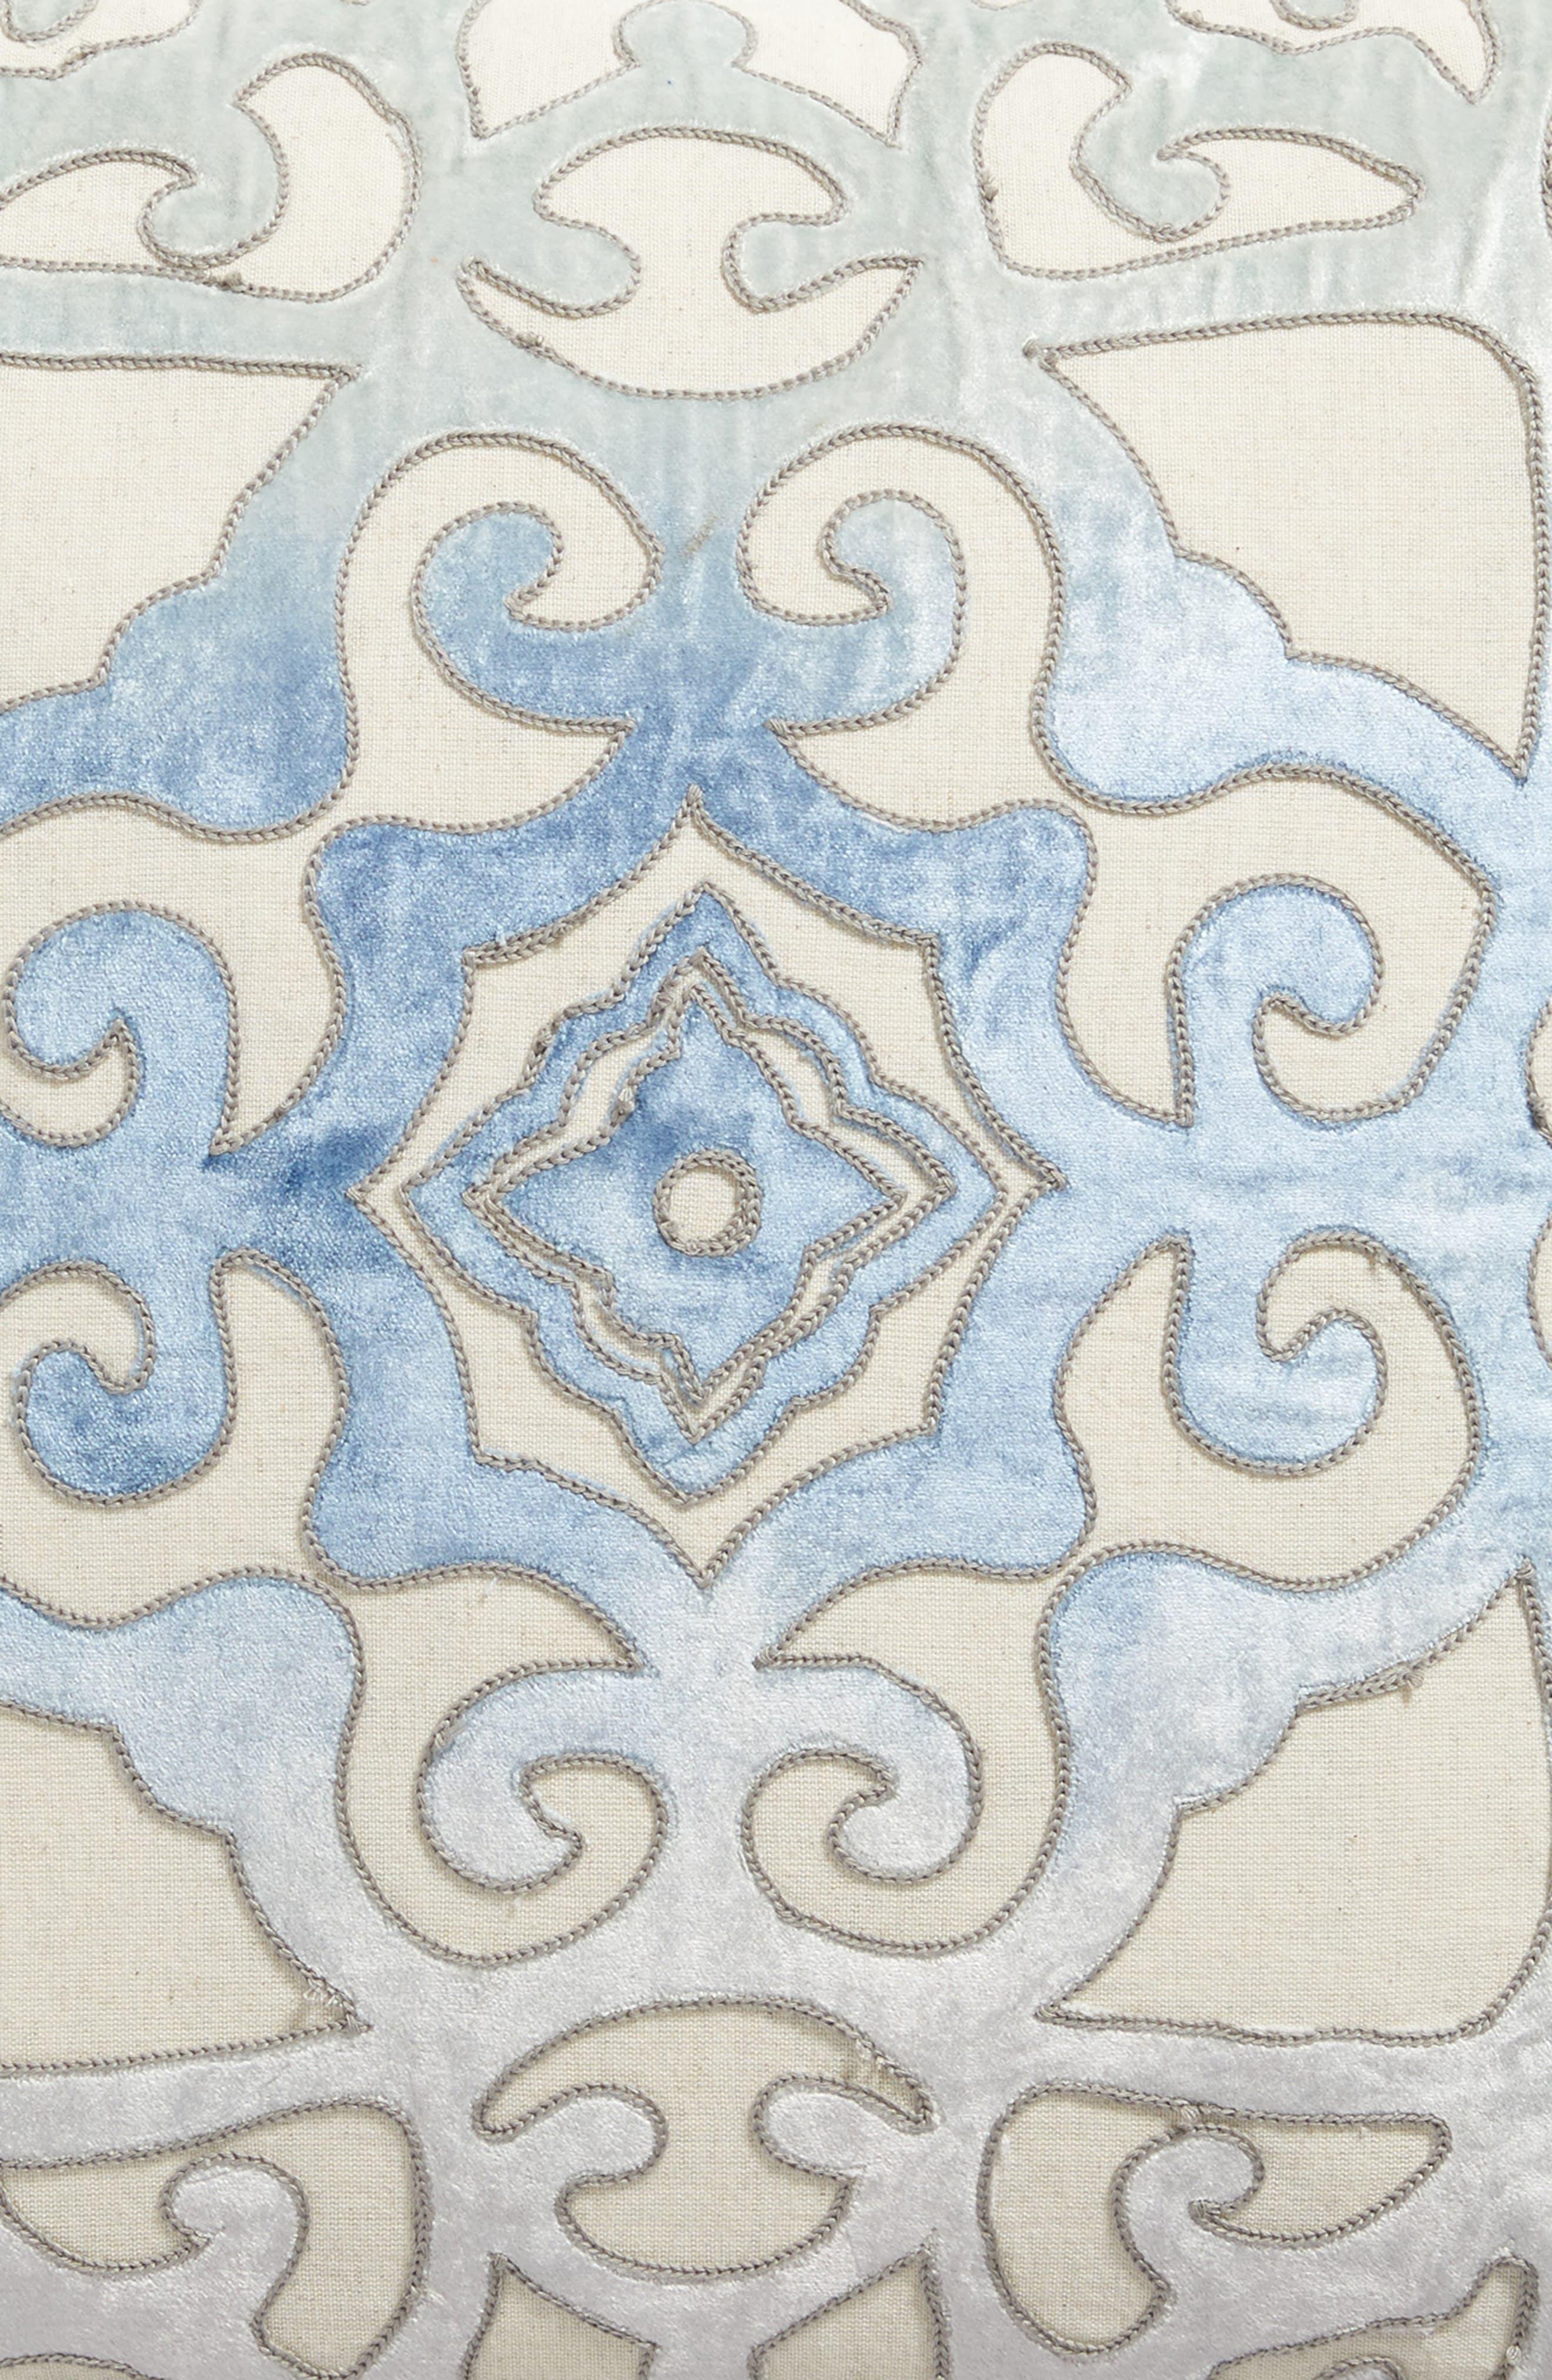 Velvet Cutout Accent Pillow,                             Alternate thumbnail 3, color,                             Blue Stellar Multi